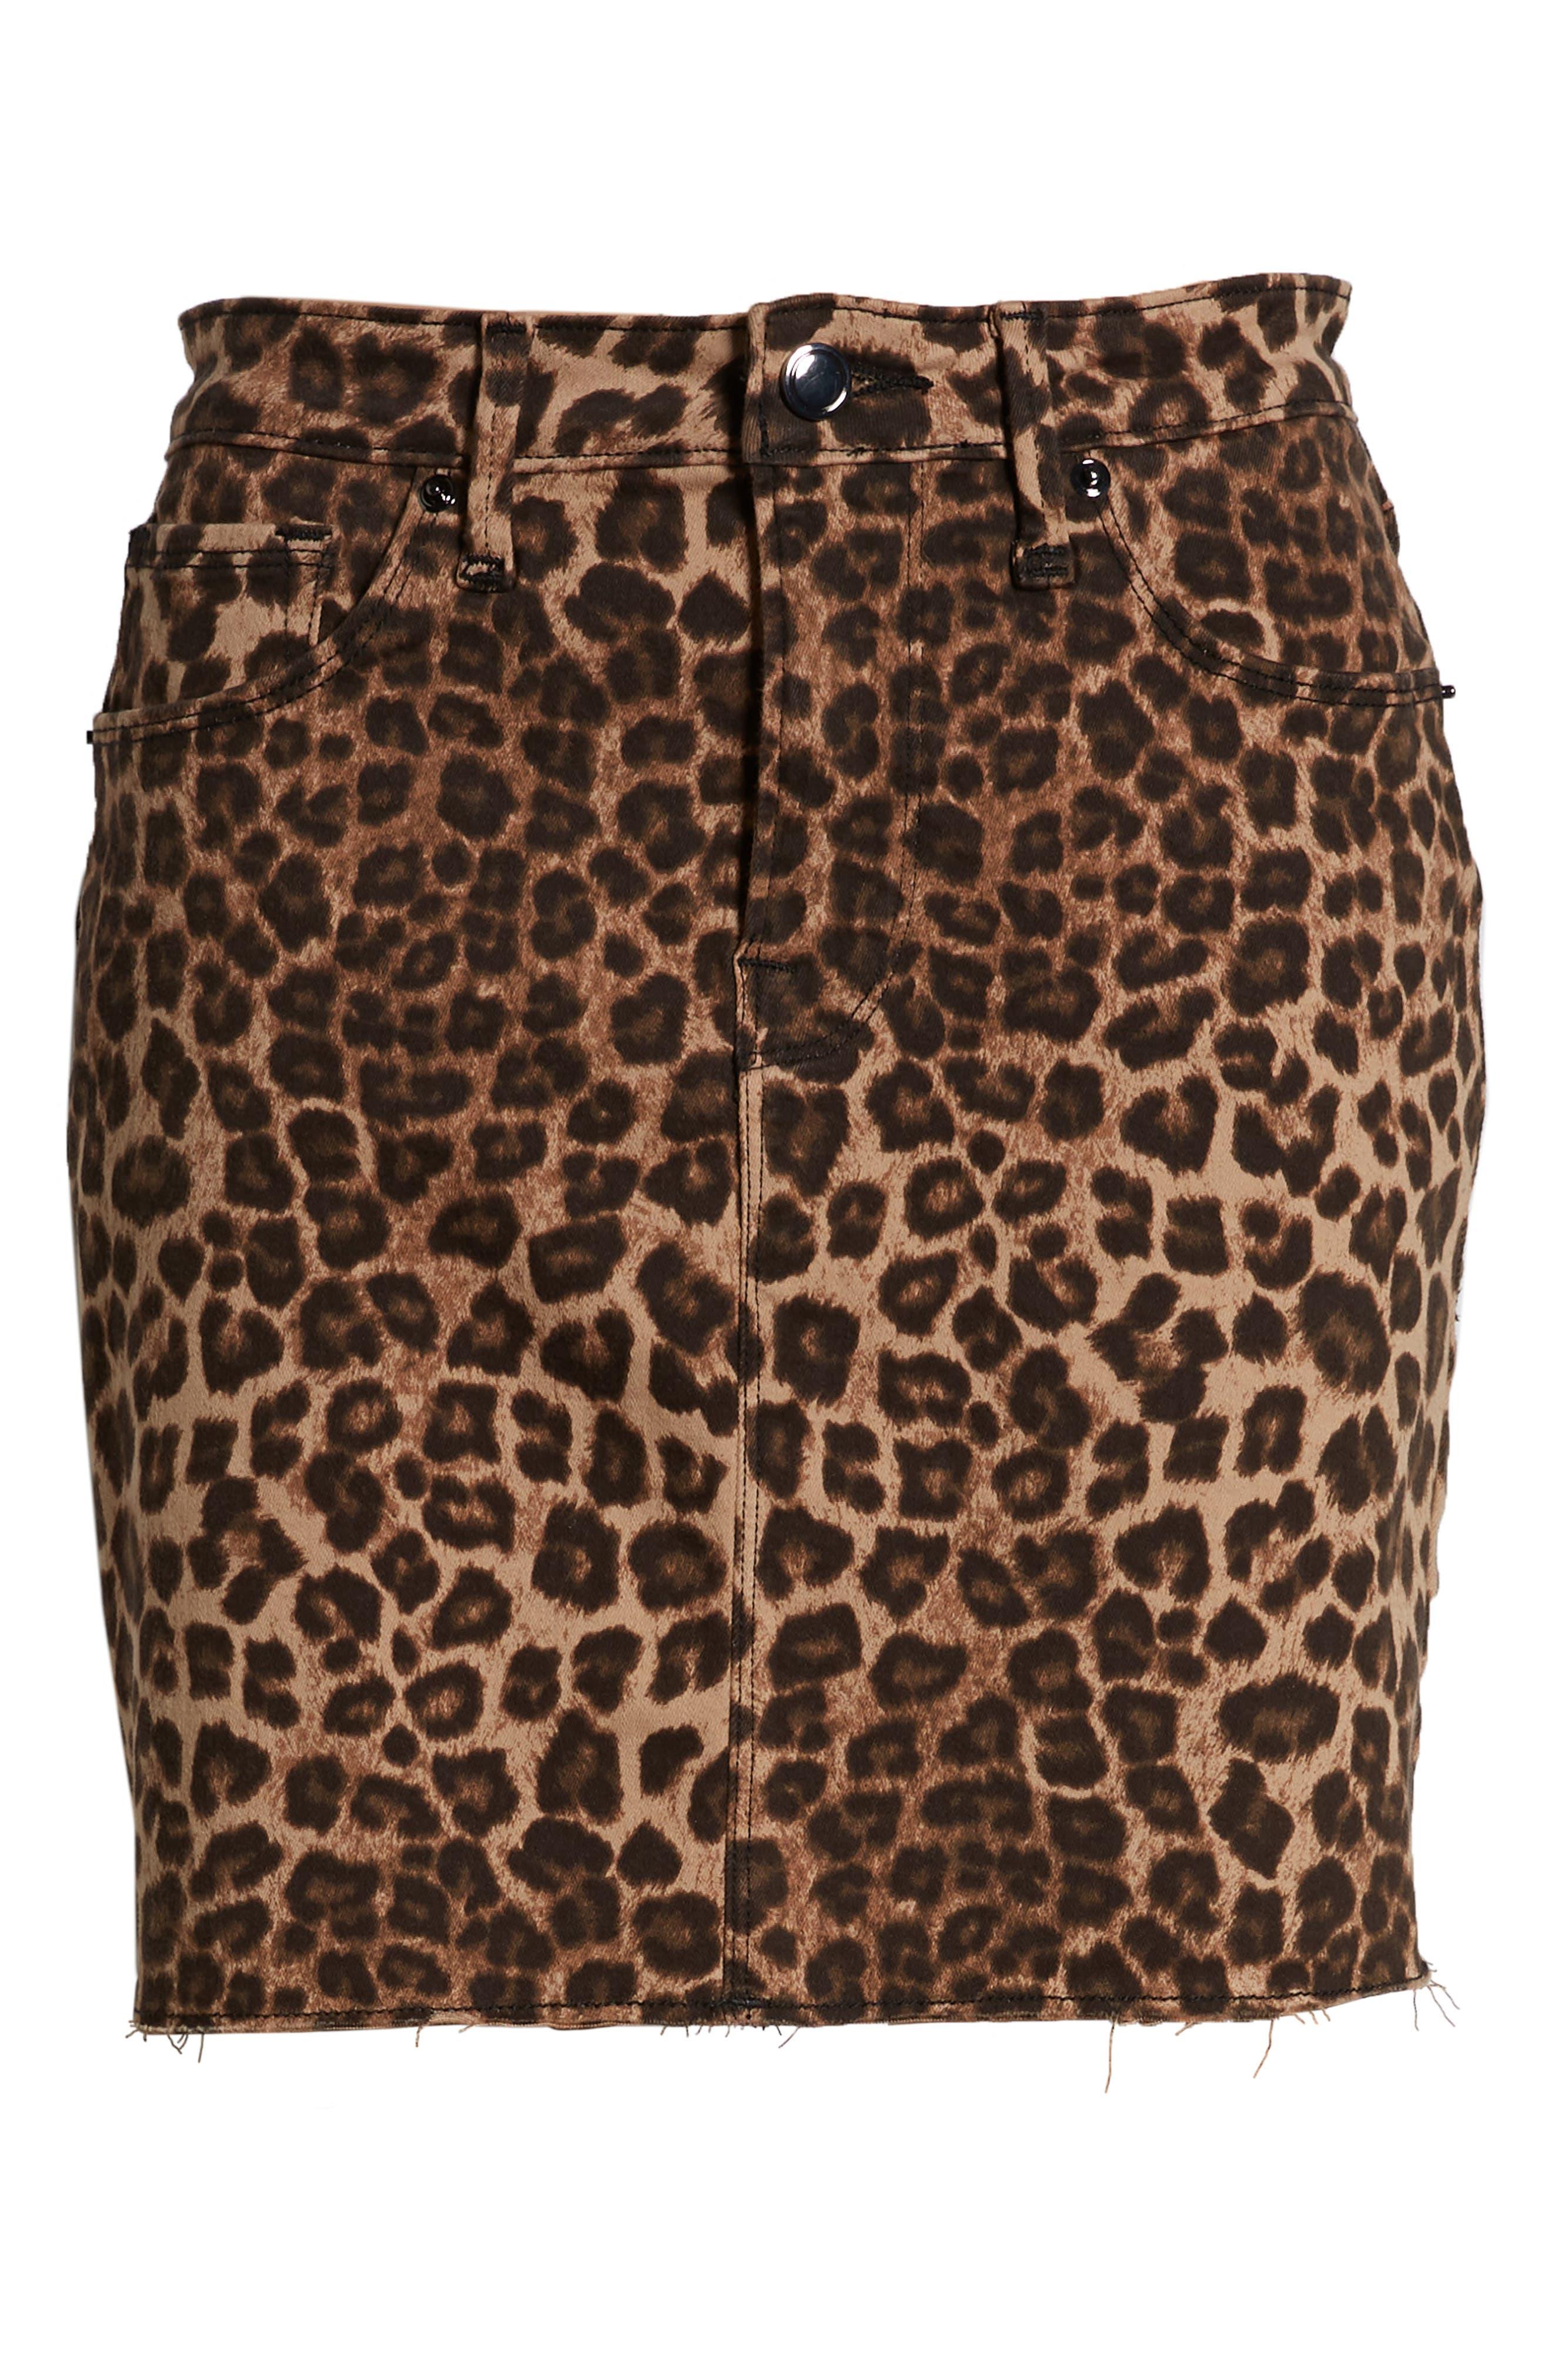 GOOD AMERICAN,                             Cheetah Print Raw Edge Miniskirt,                             Alternate thumbnail 7, color,                             CHEETAH001